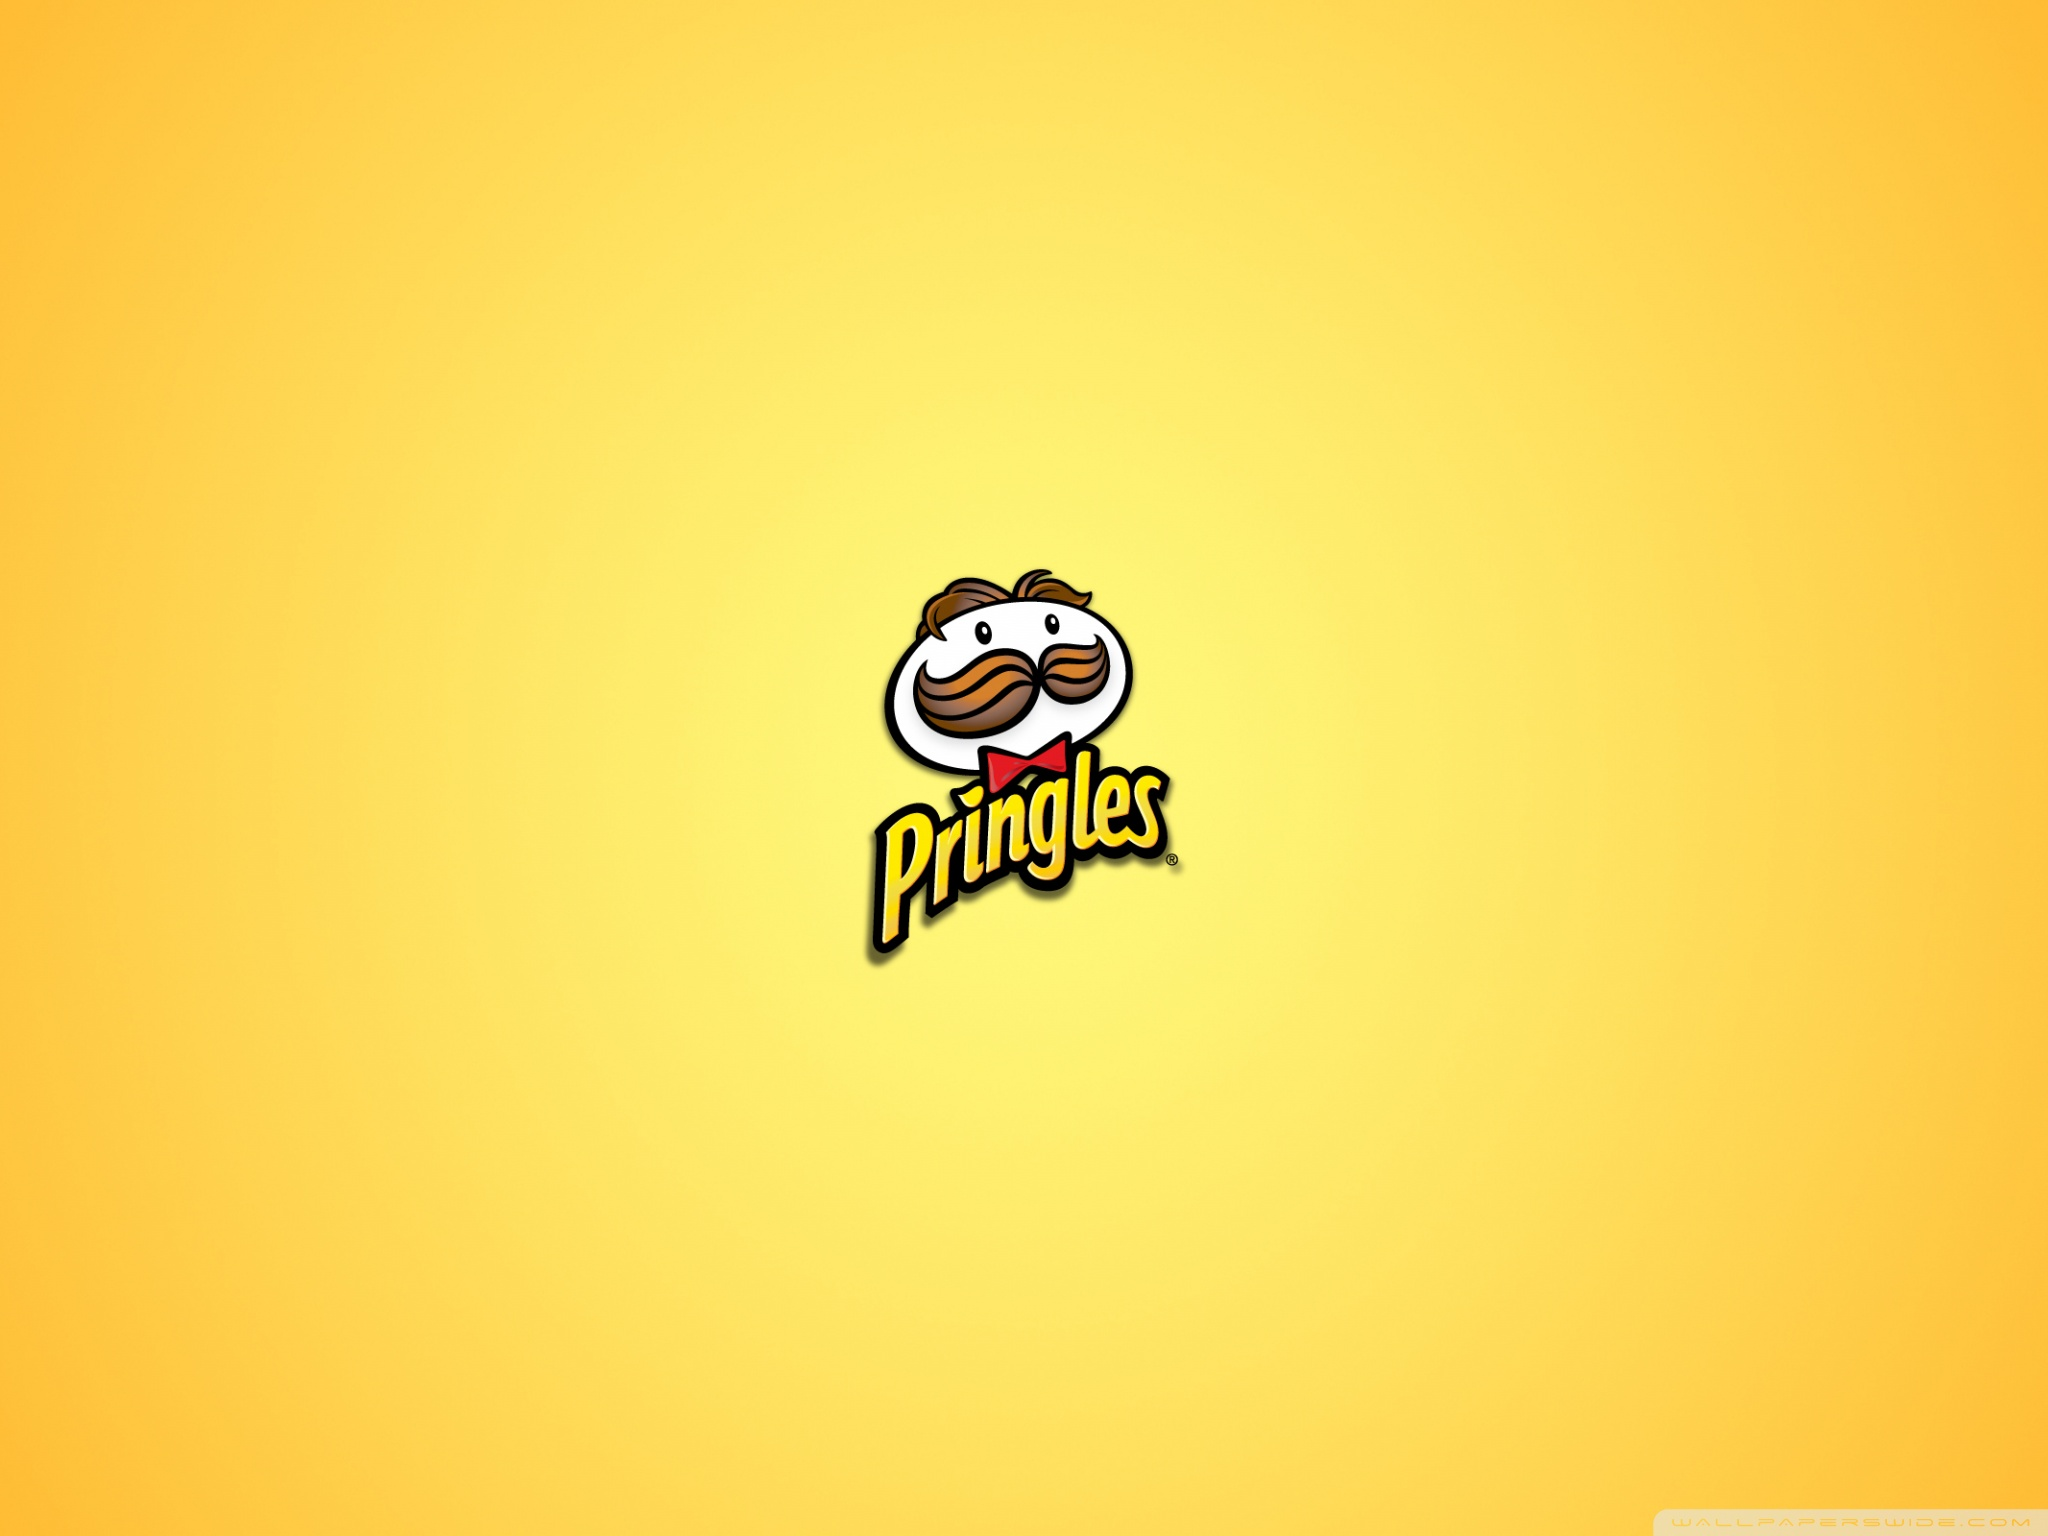 Pringles Guy 4K HD Desktop Wallpaper for 4K Ultra HD TV Dual 2048x1536